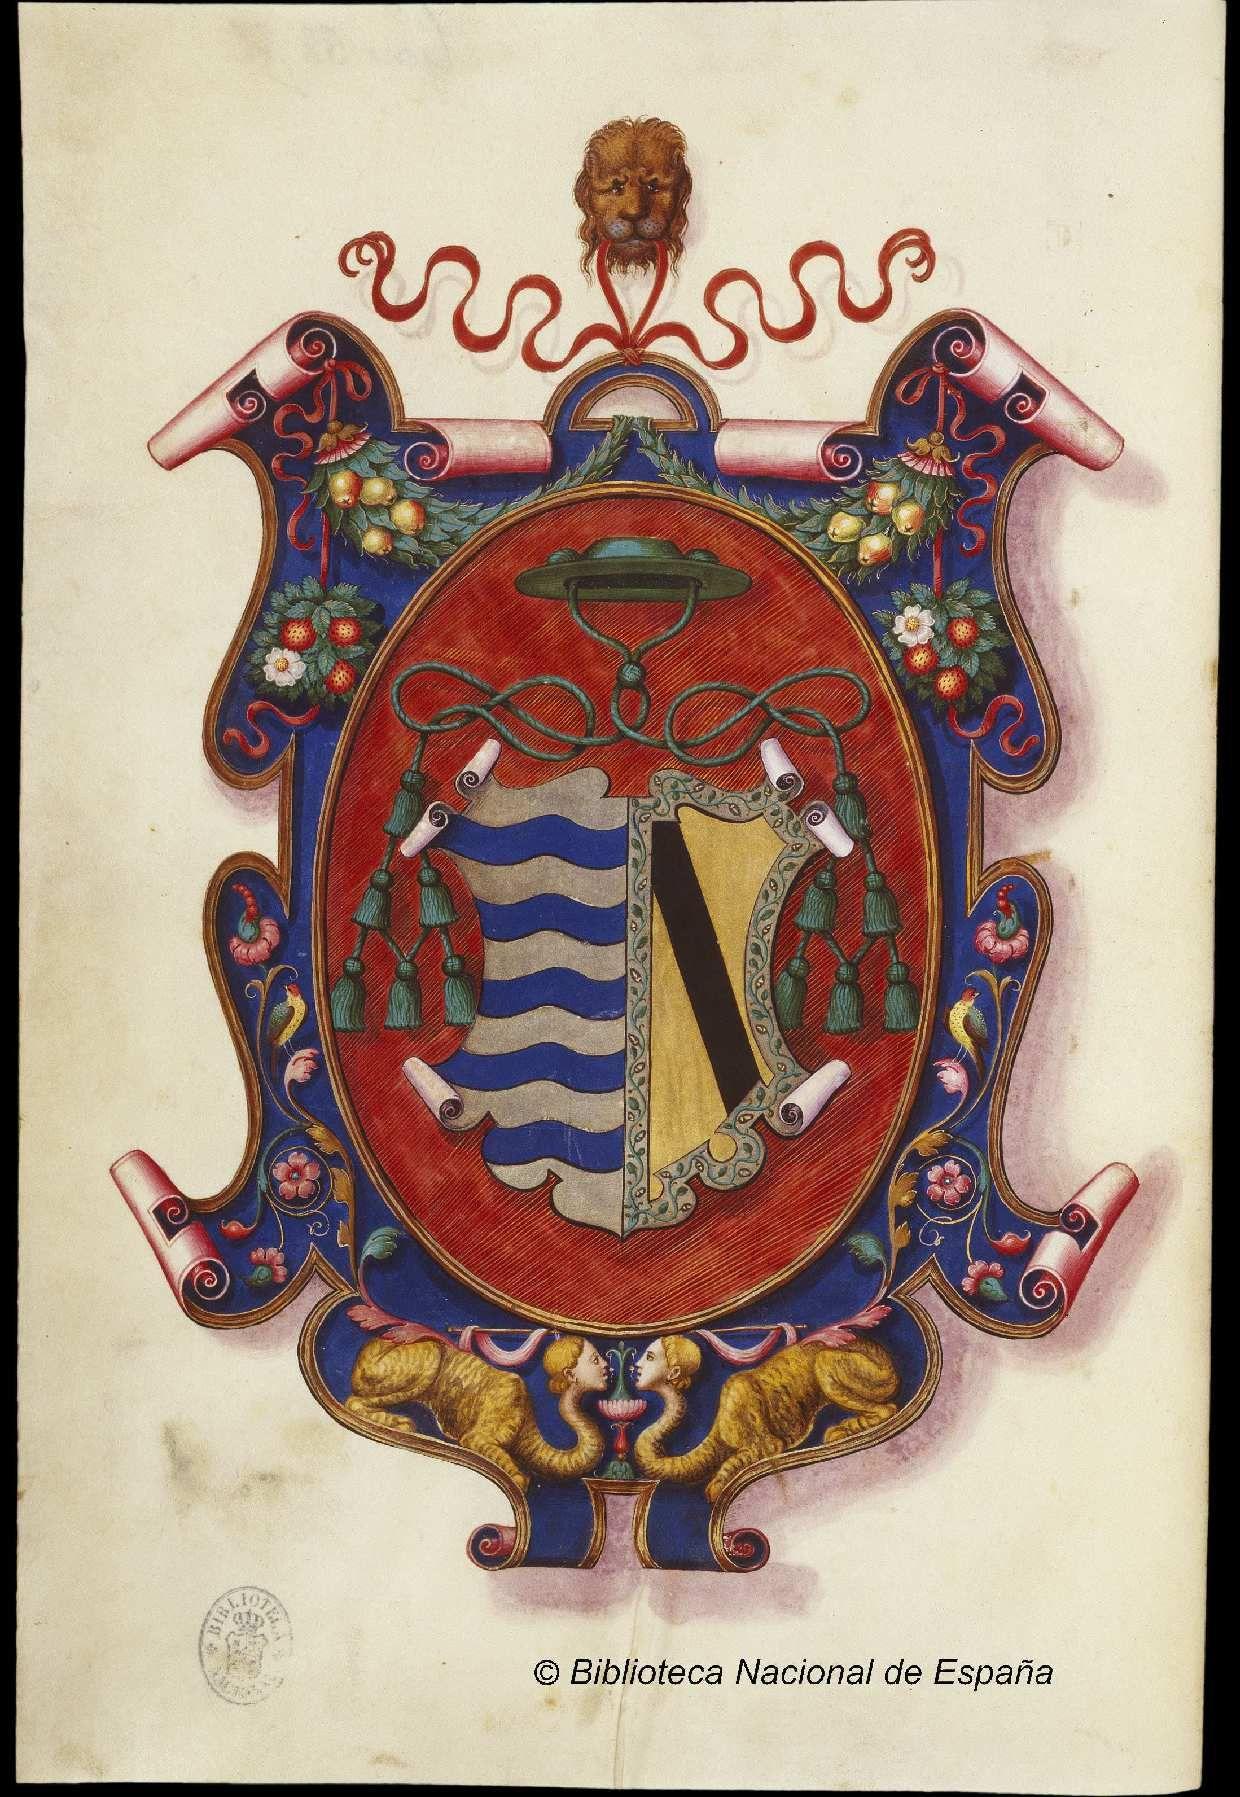 Escudo De D Gutierre De Vargas Y Carvajal Obispo De Plasencia Escudo Escudo De Armas Biblioteca Nacional De Espana